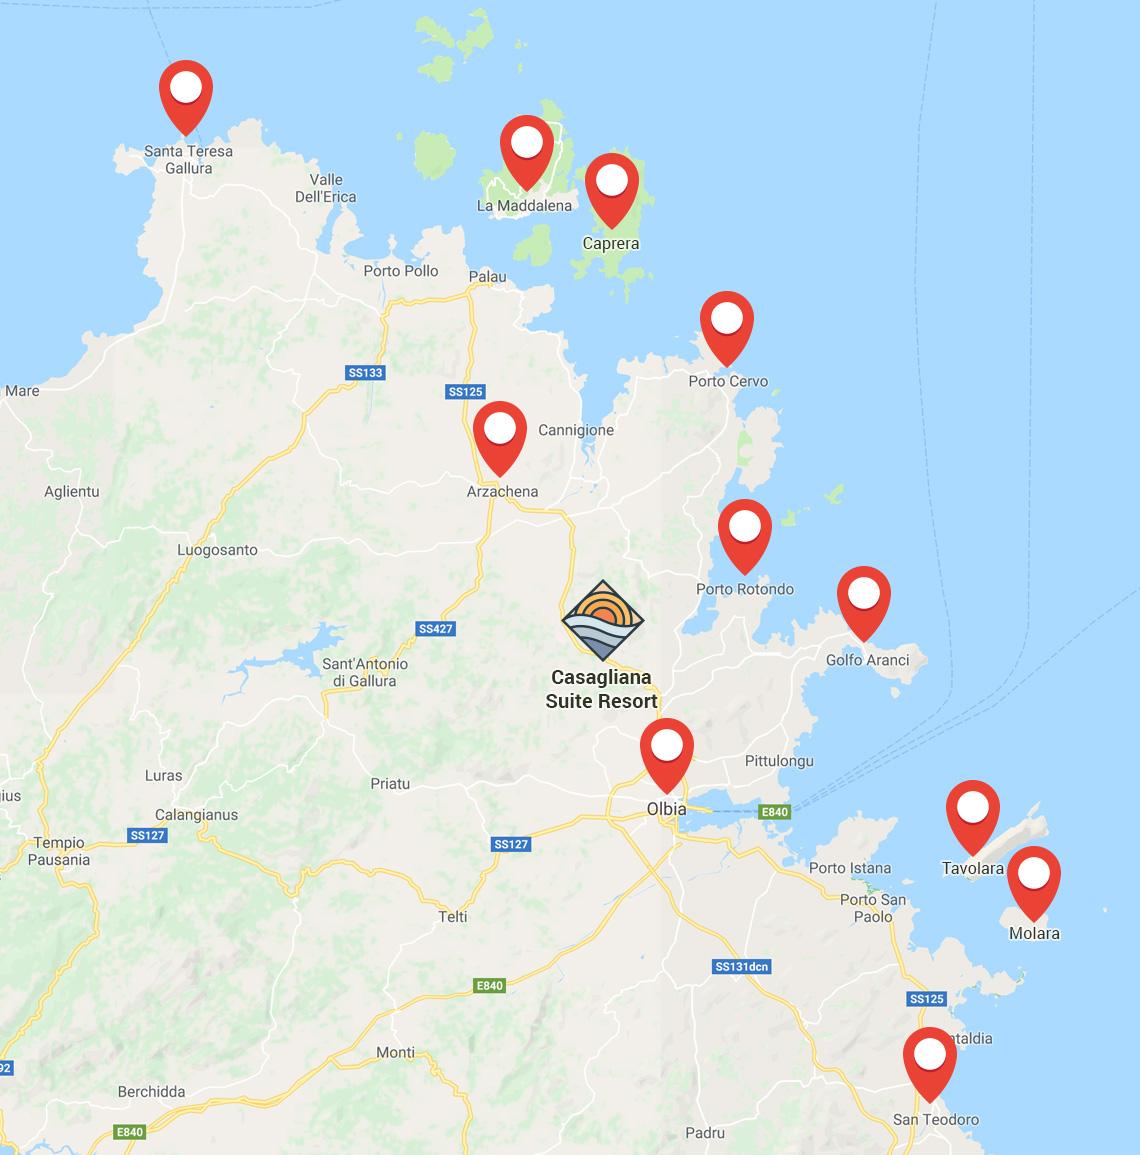 Cartina Sardegna Golfo Aranci.Casagliana Resort The Ideal Place To Find Again Your Comfort